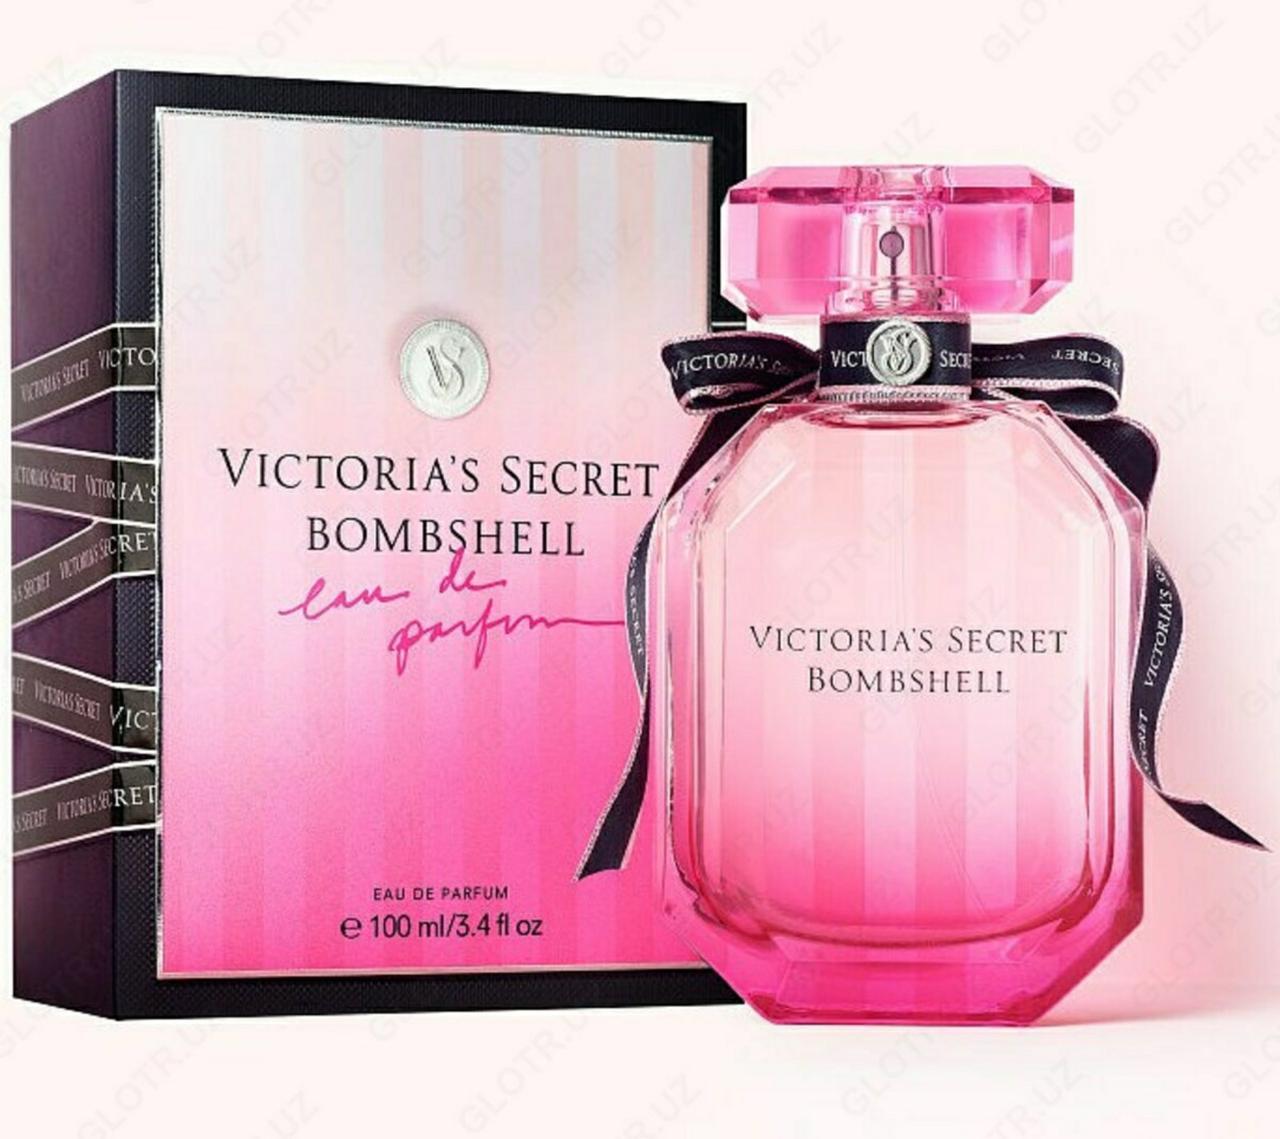 Женская парфюмерная вода Victorias Secret Bombshell (Виктория Сикрет бомбшелл) 100 мл